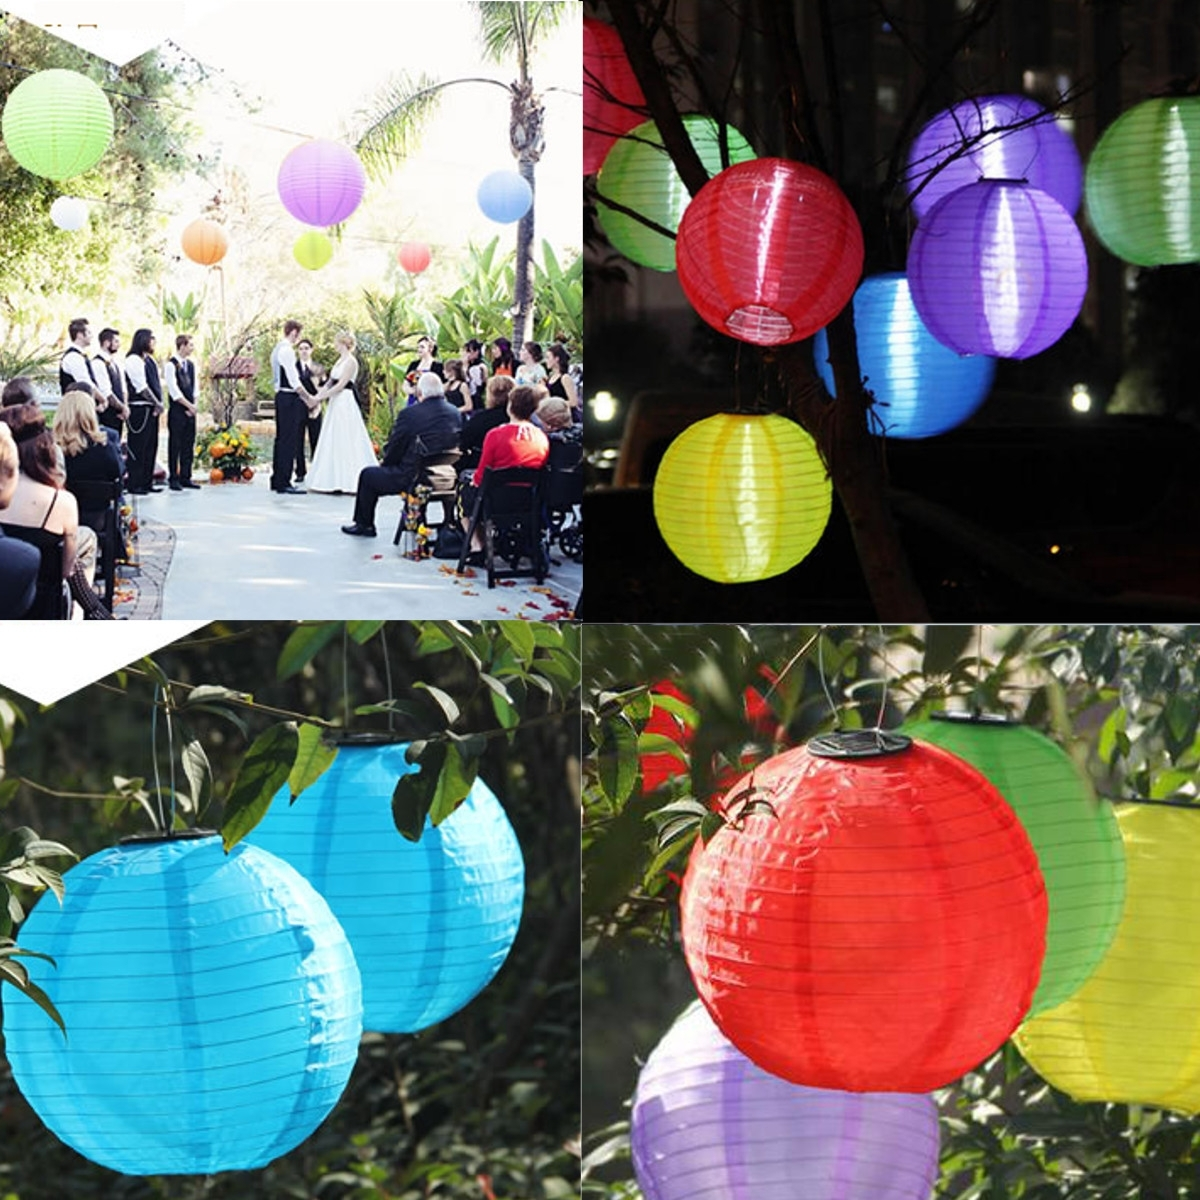 Favorite Outdoor Nylon Lanterns Throughout Halloween Party Led Nylon Lantern 44cm Outdoor Solar Power Chinese (View 10 of 20)